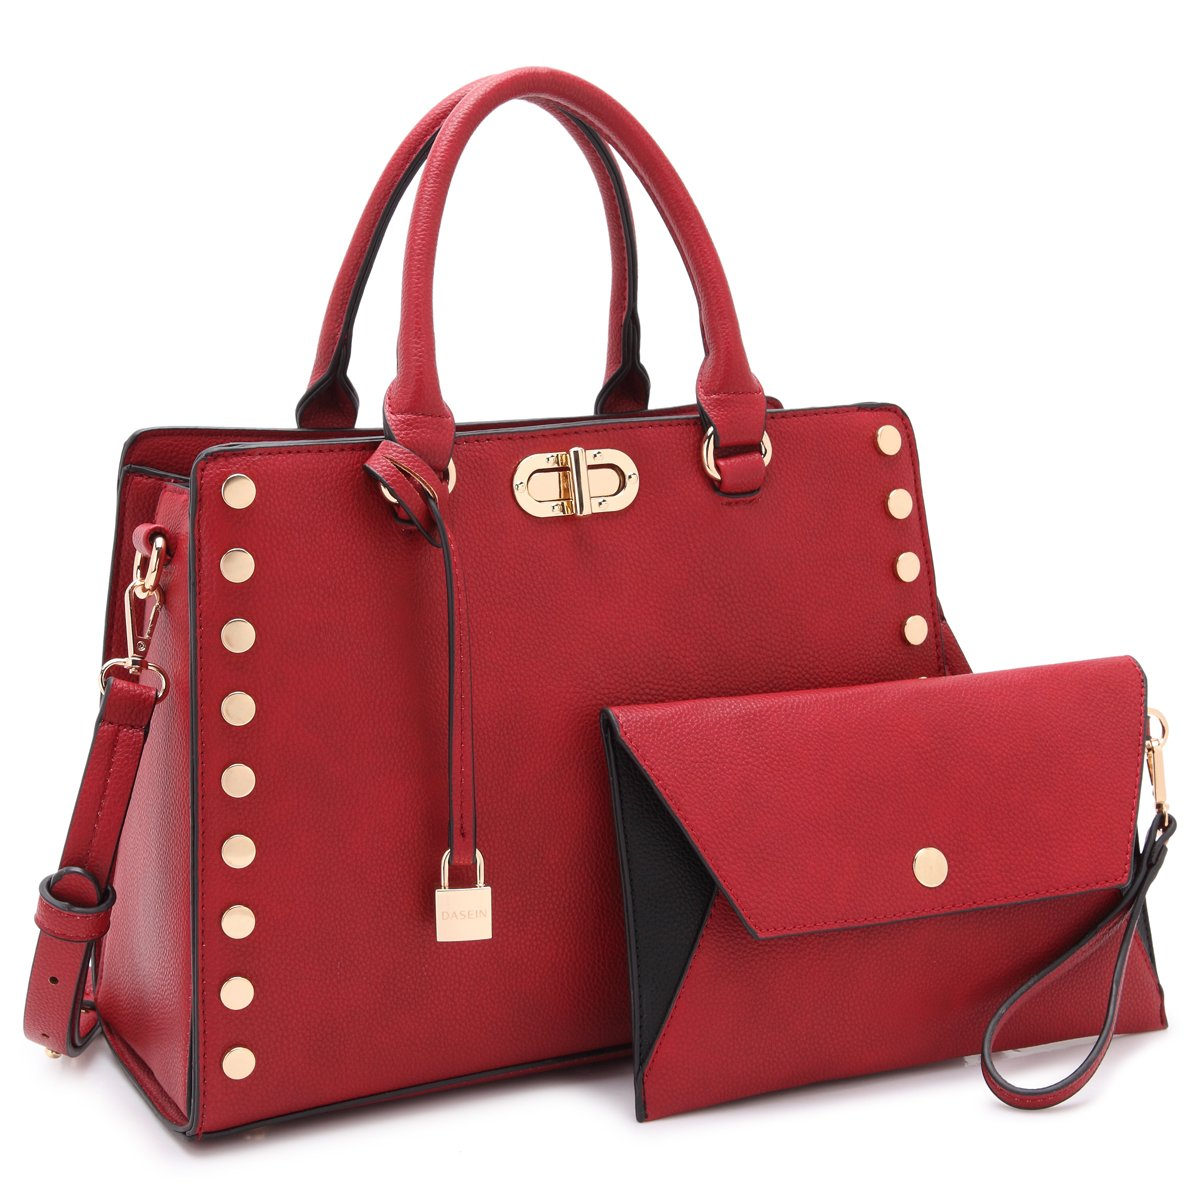 08cf9f64641c Designer Handbags Purses For Women Tassel Lock Satchel Bags Top Handle  Shoulder Bag With Matching Wallet